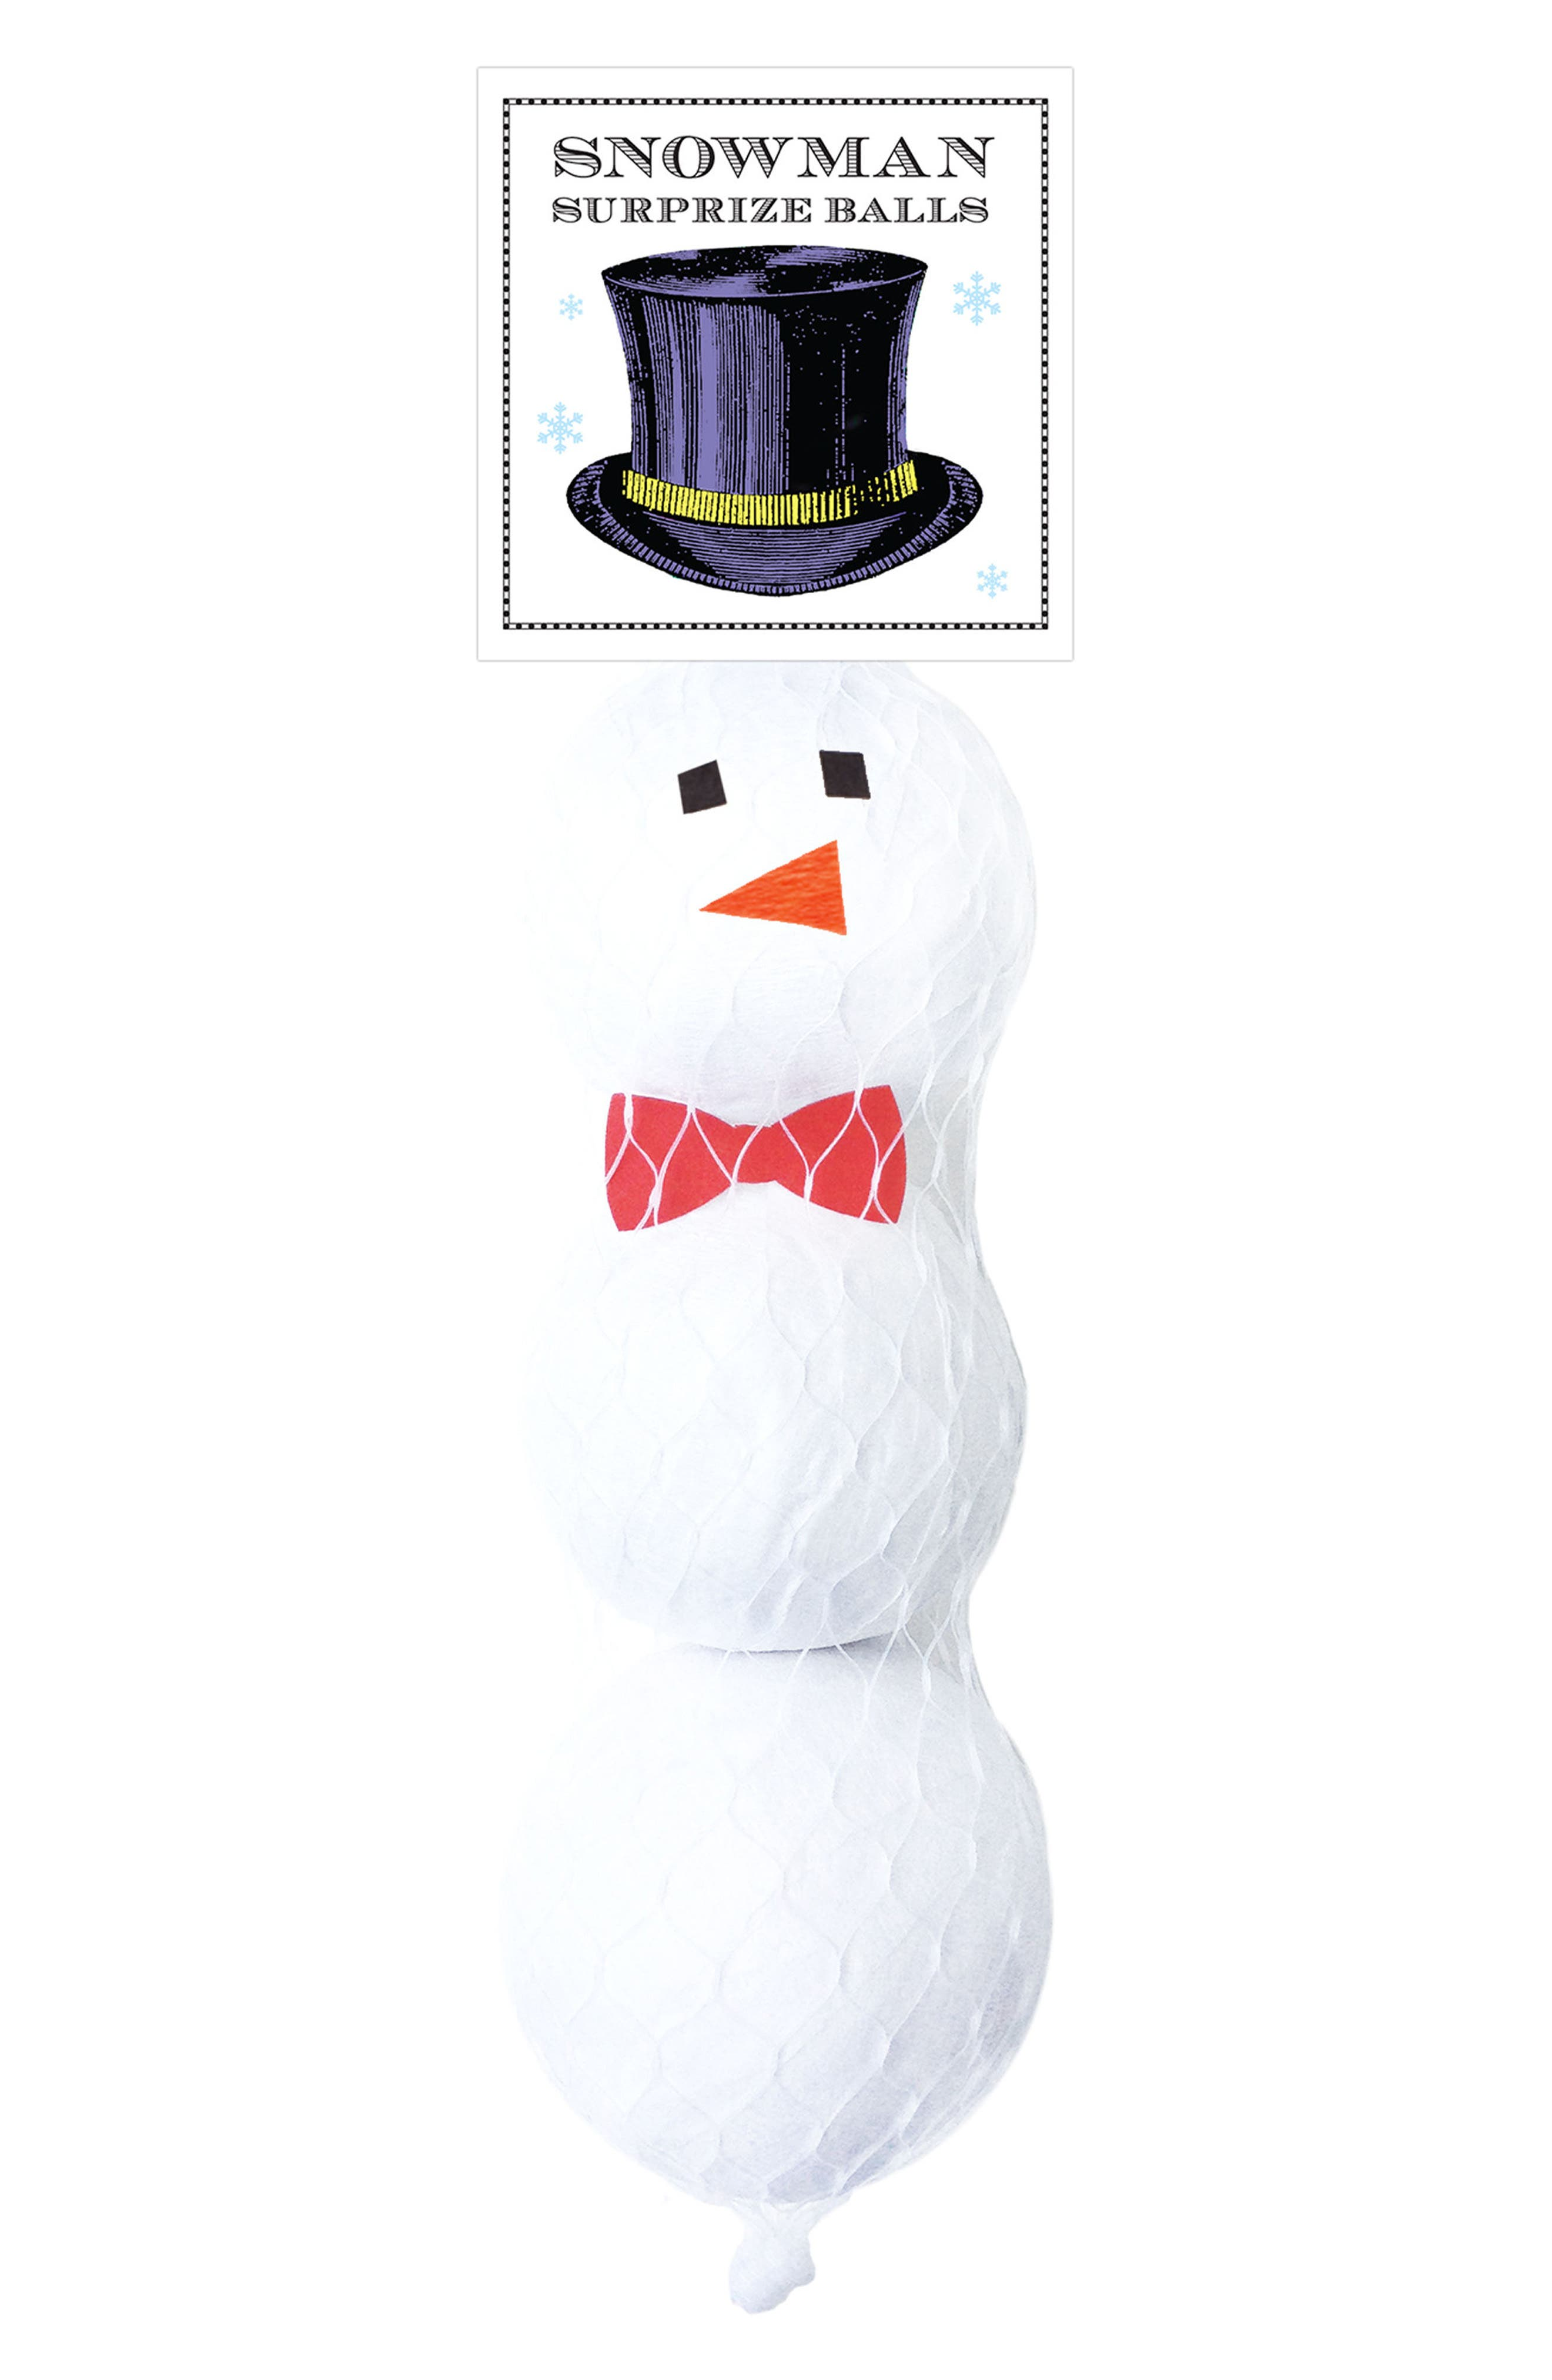 Tops Malibu 3-Piece Mini Surprize Balls Snowman Set